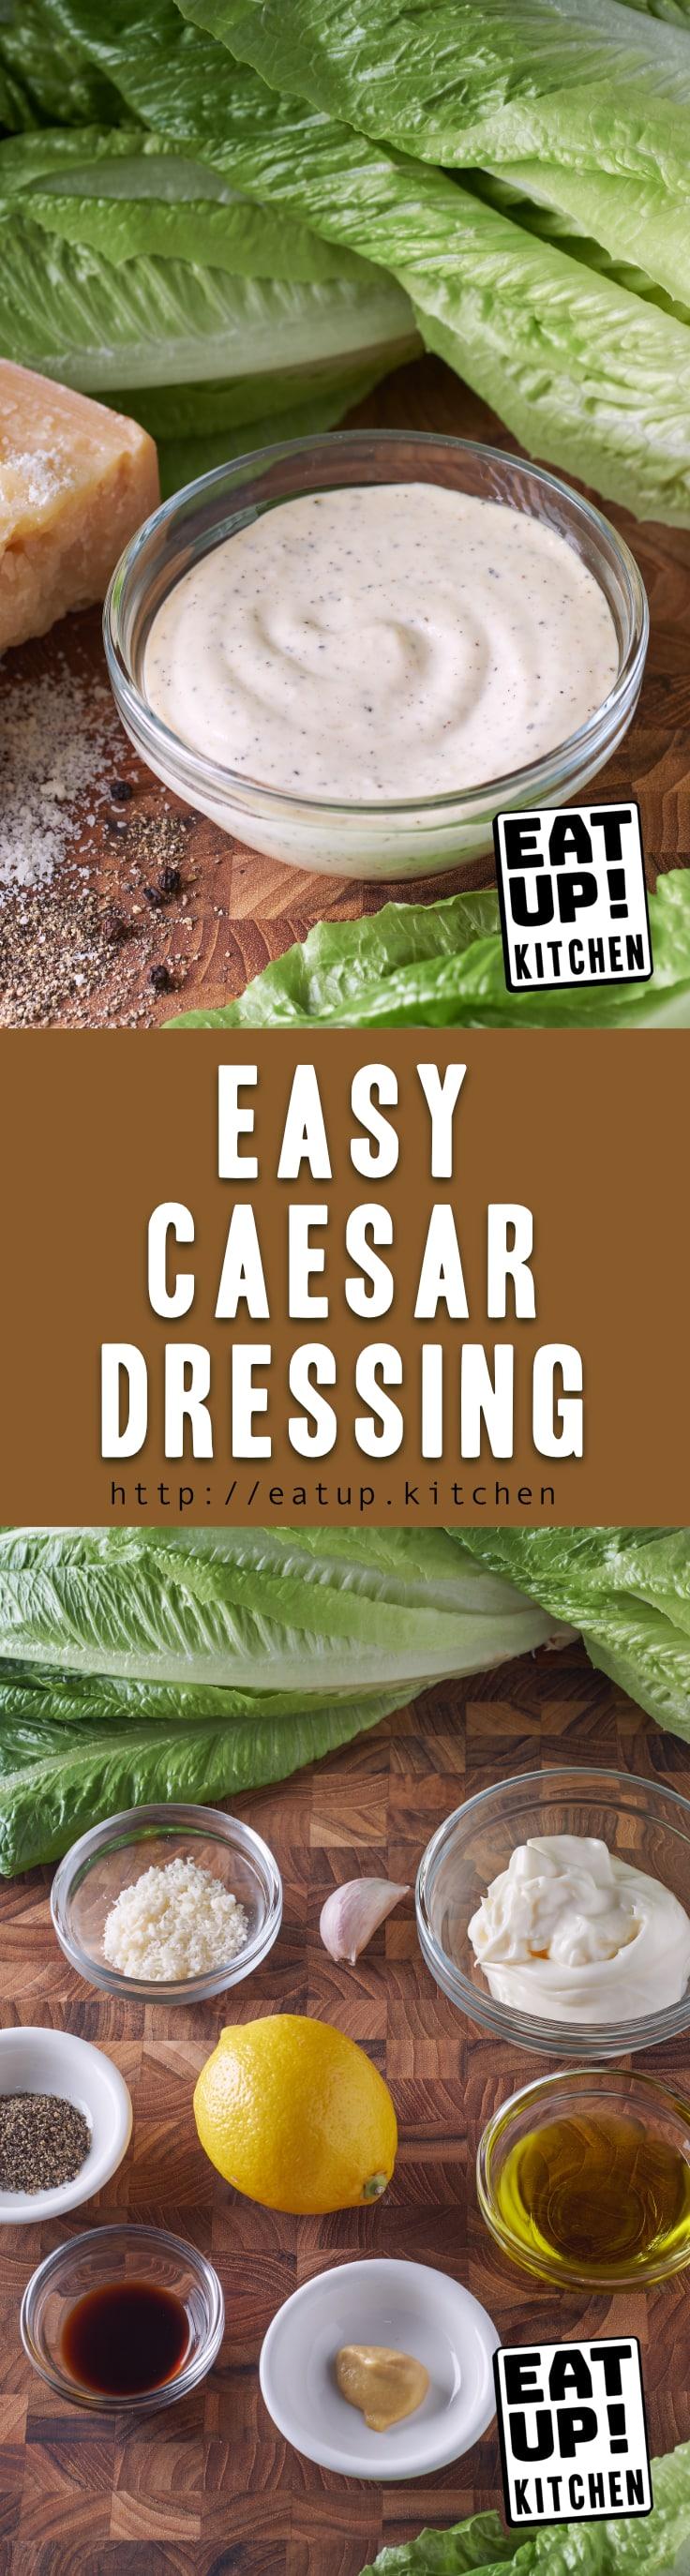 Easy Caesar Dressing